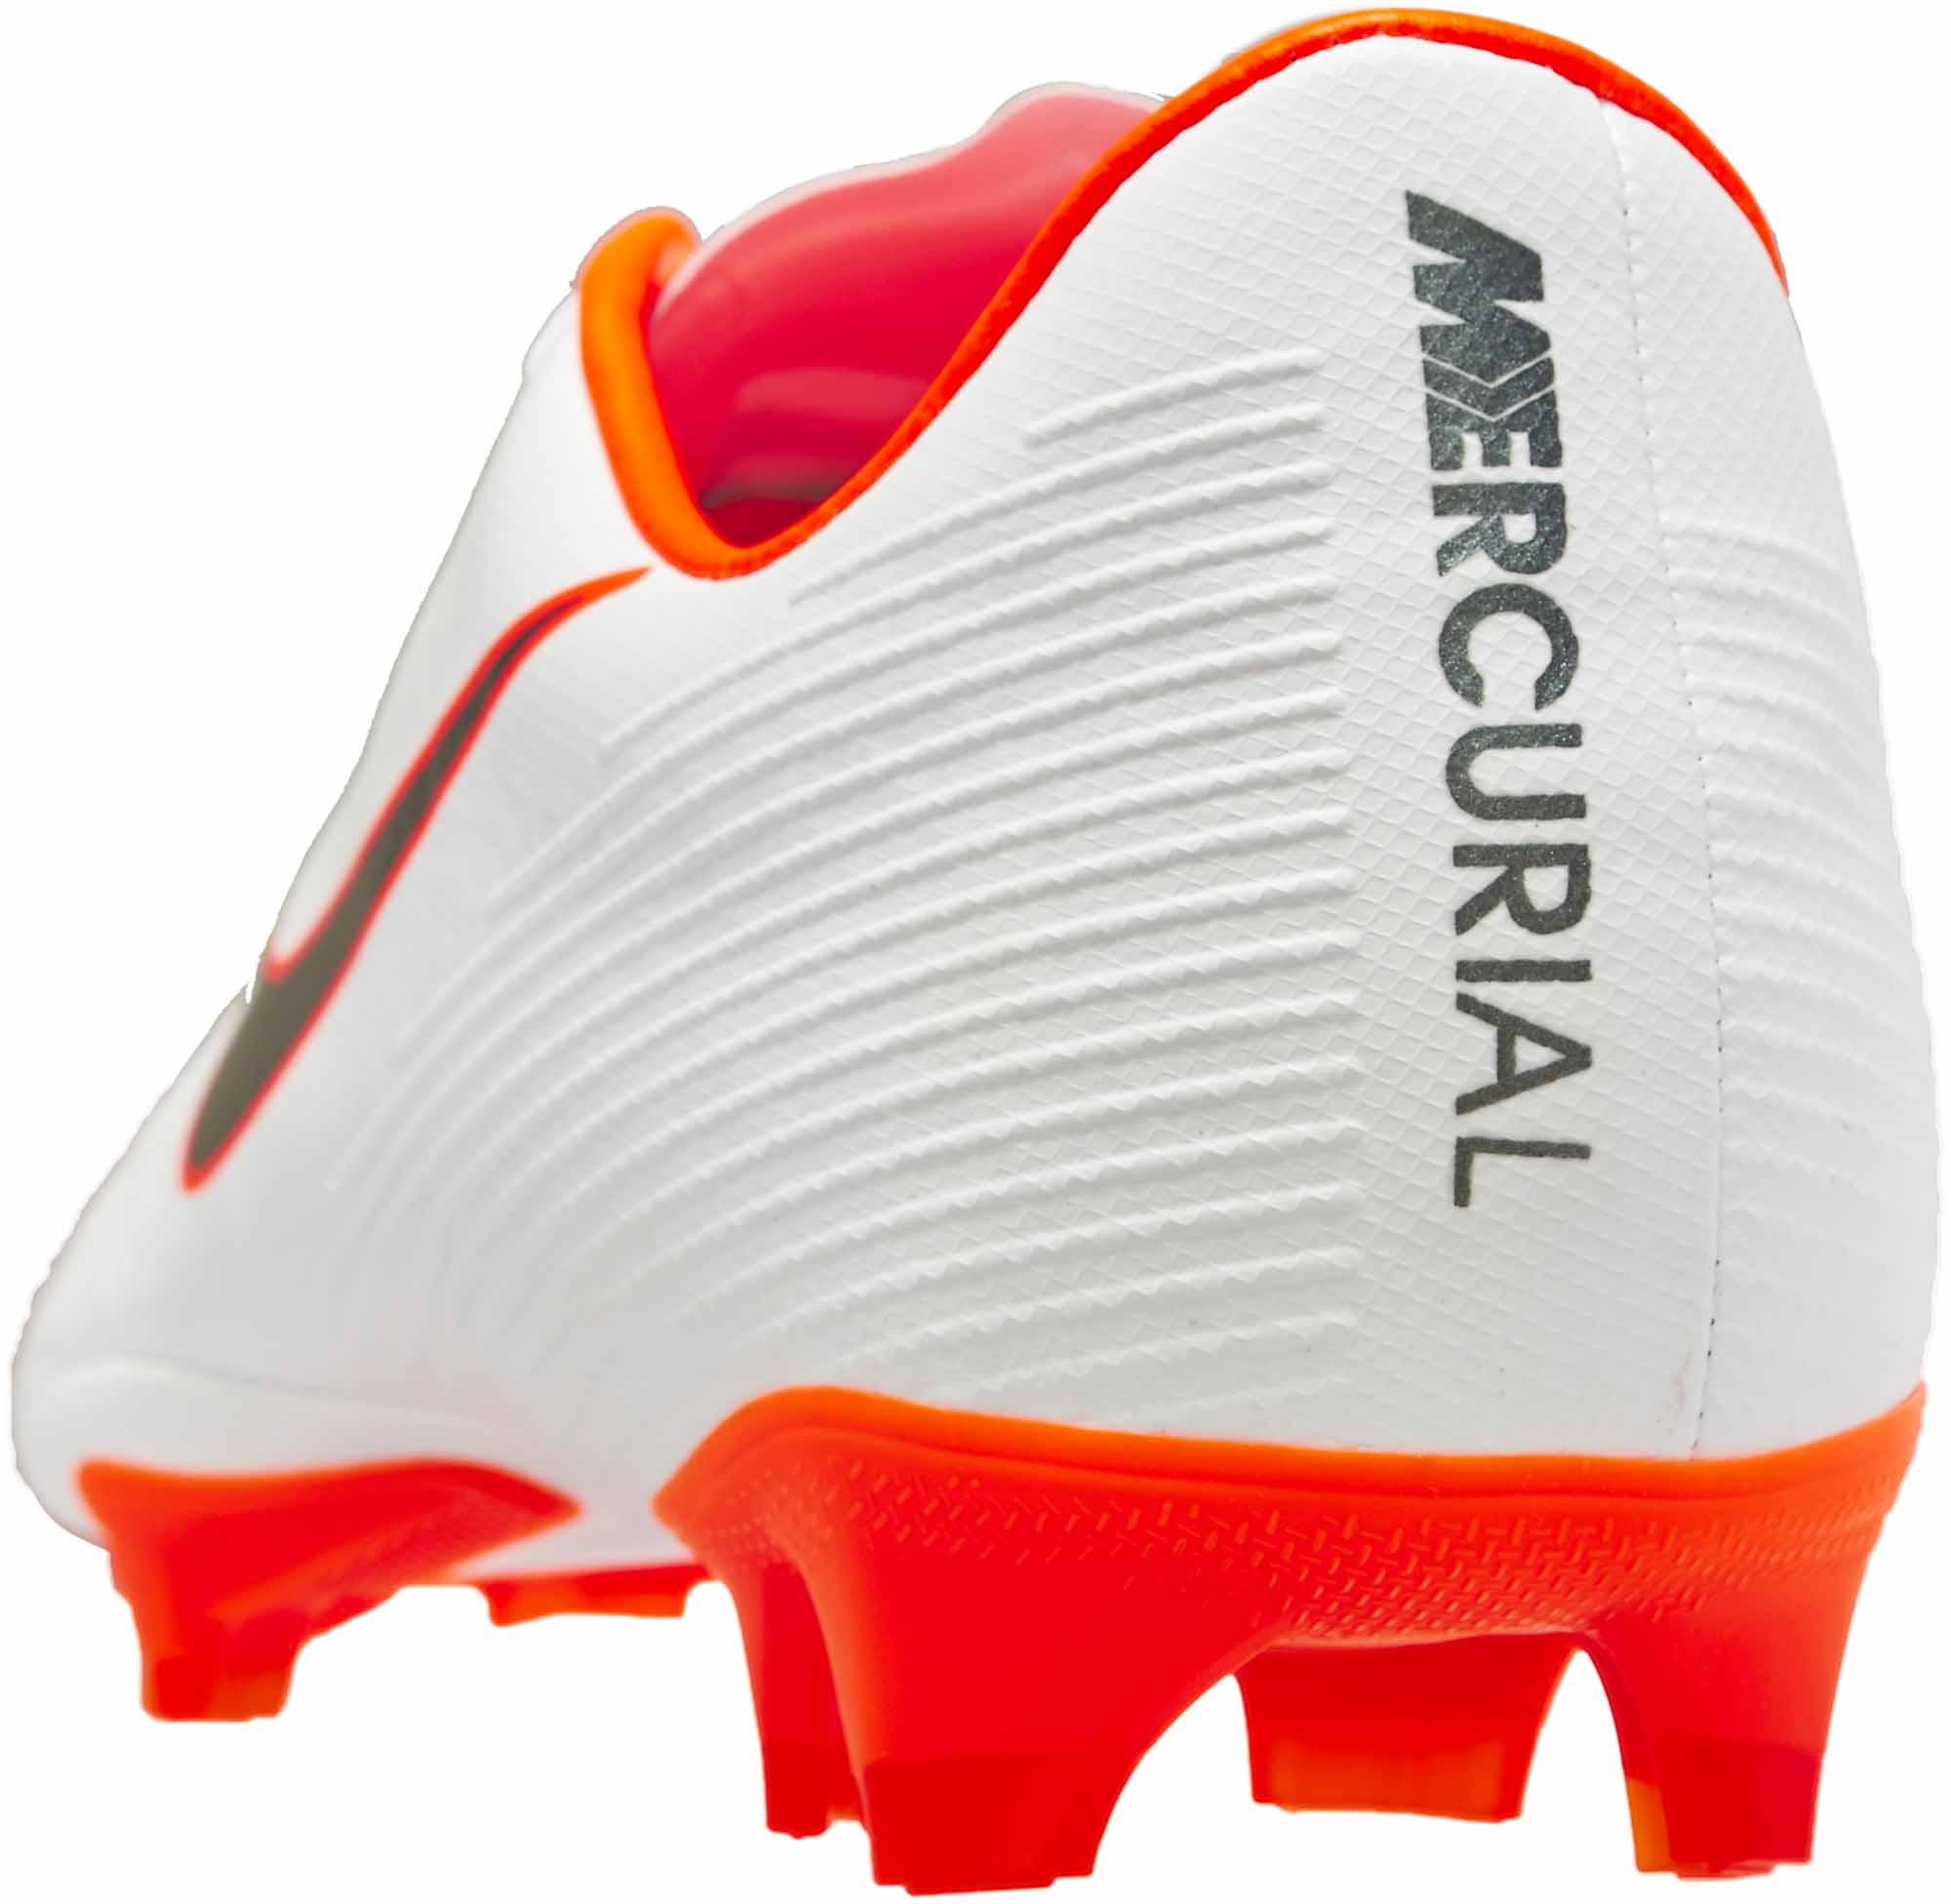 eee38a69984e2 Nike Mercurial Vapor 12 Pro FG – White/Metallic Cool Grey/Total Orange